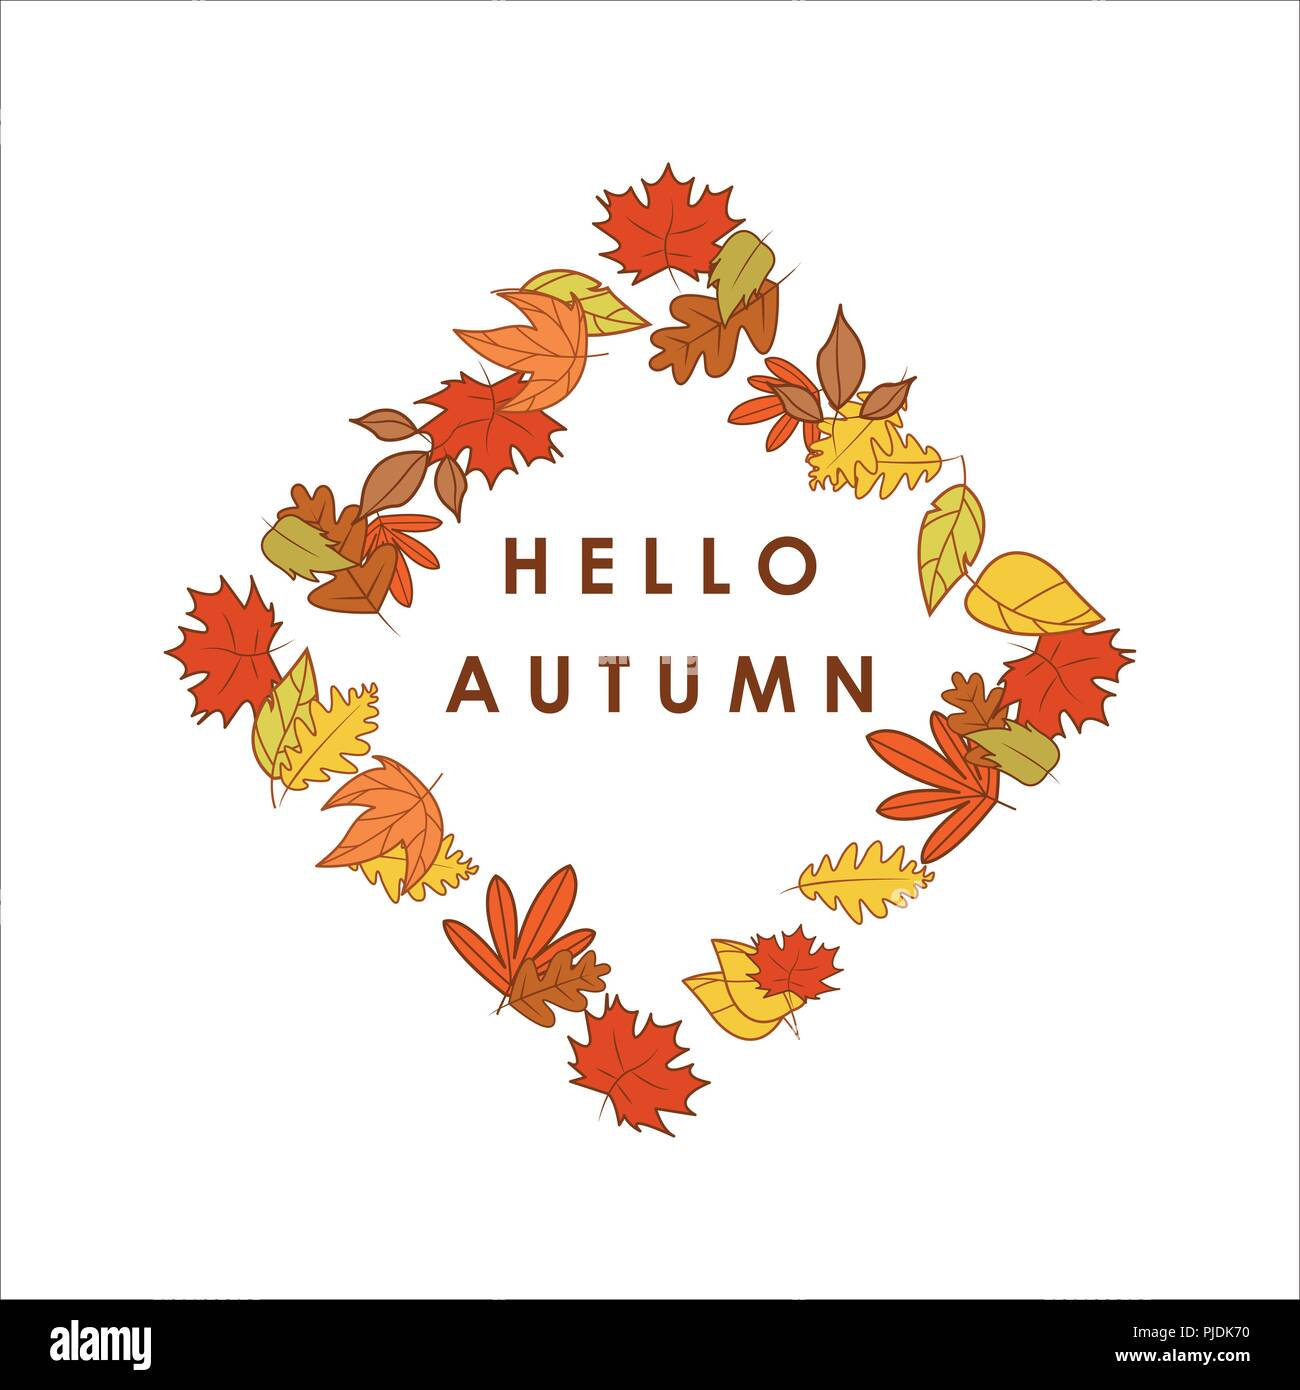 hello autumn greeting diamond shape dry leaves frame illustration